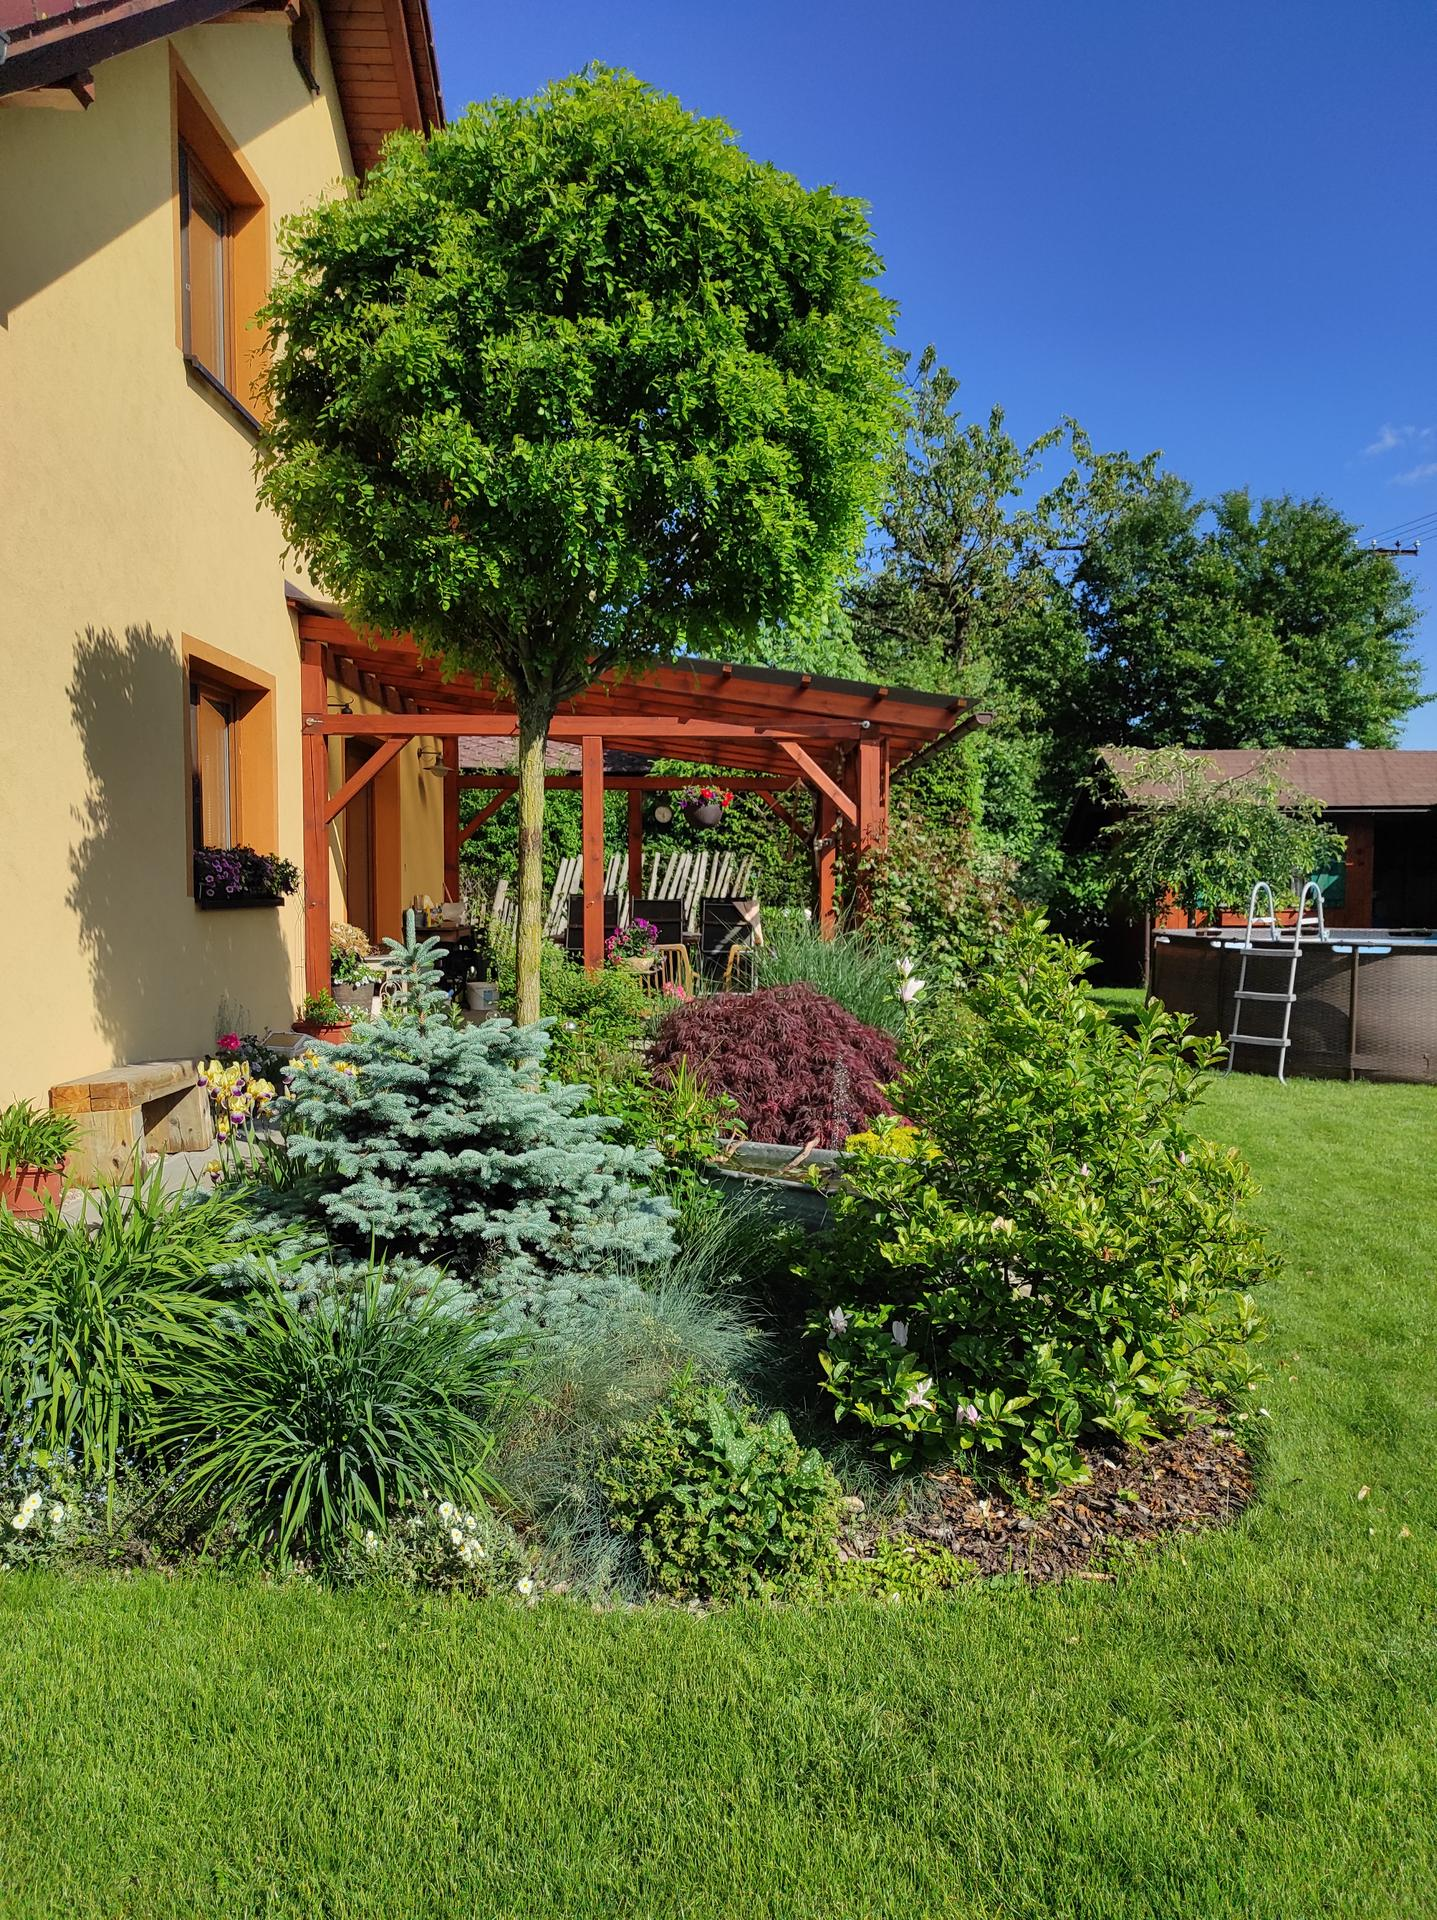 Zahrada 2021 - Obrázek č. 41